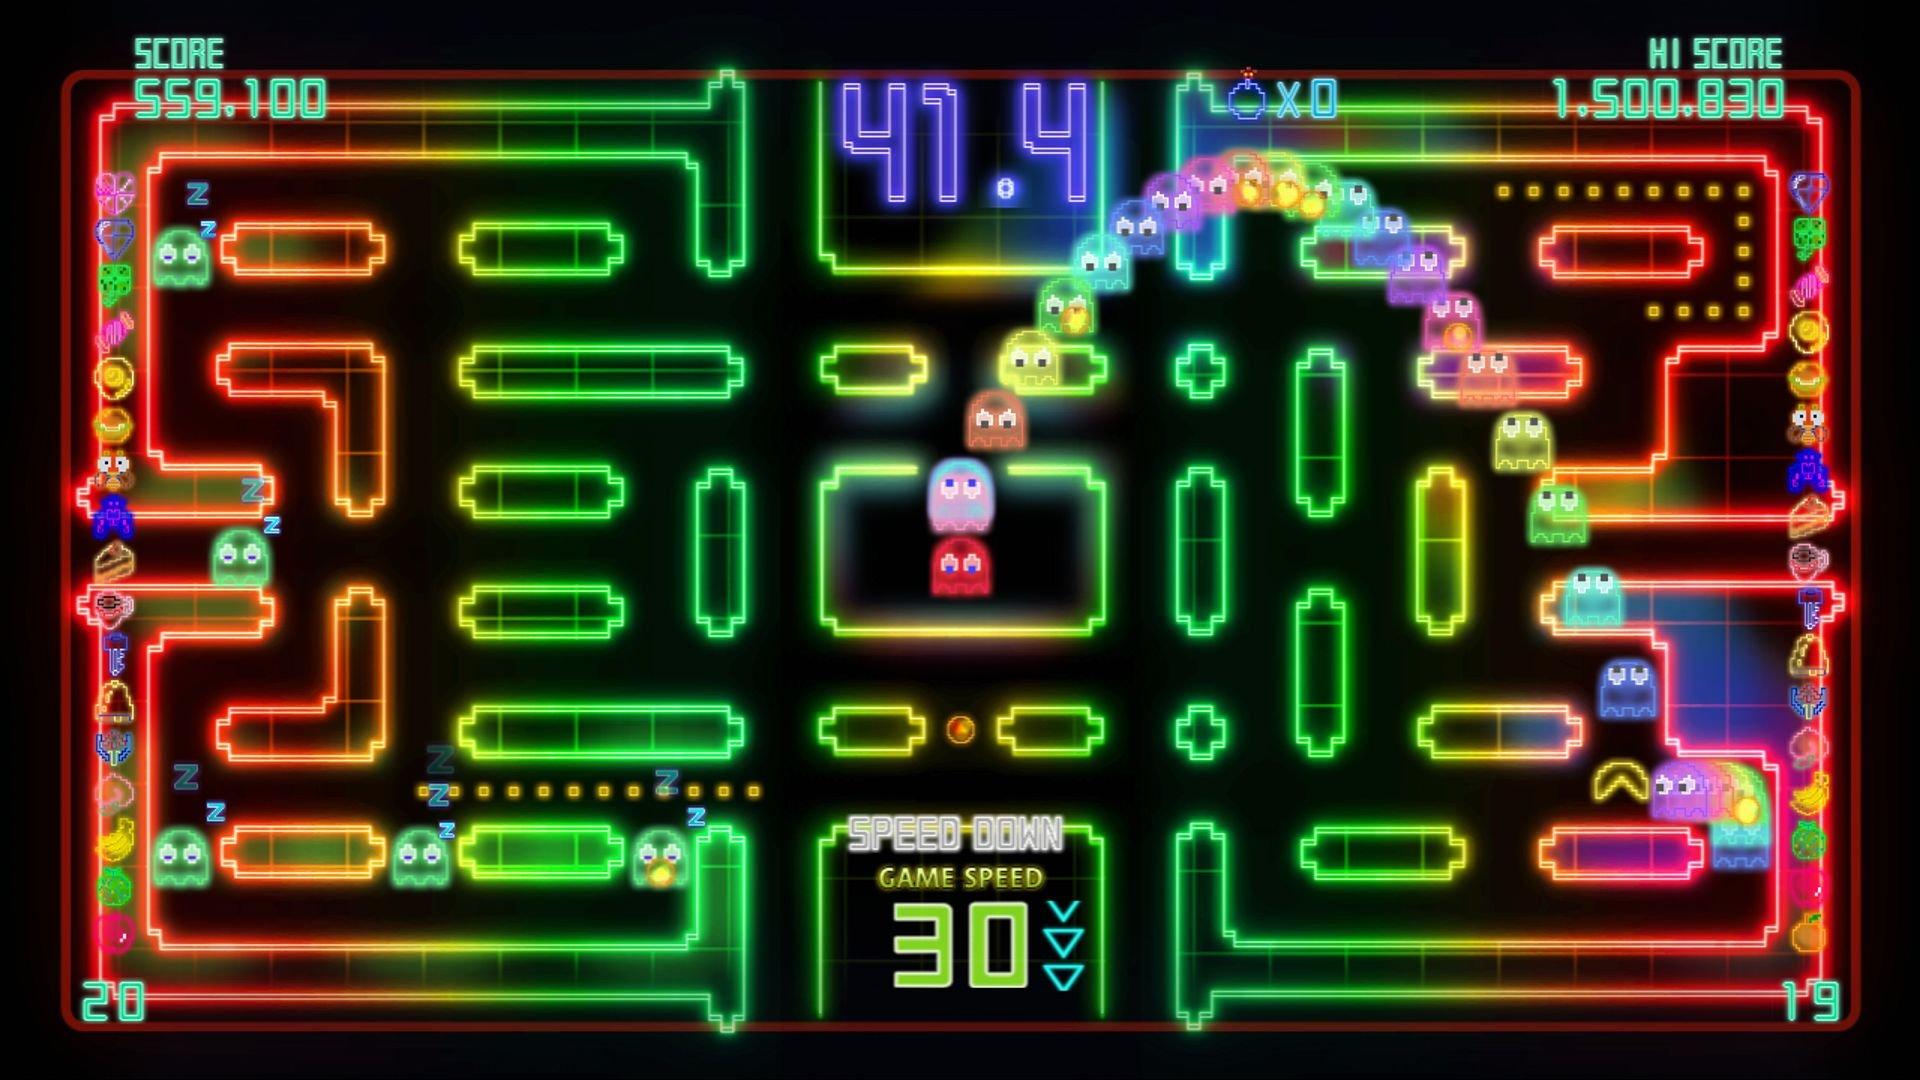 pac man championship edition 2 arcade game series playstation 4